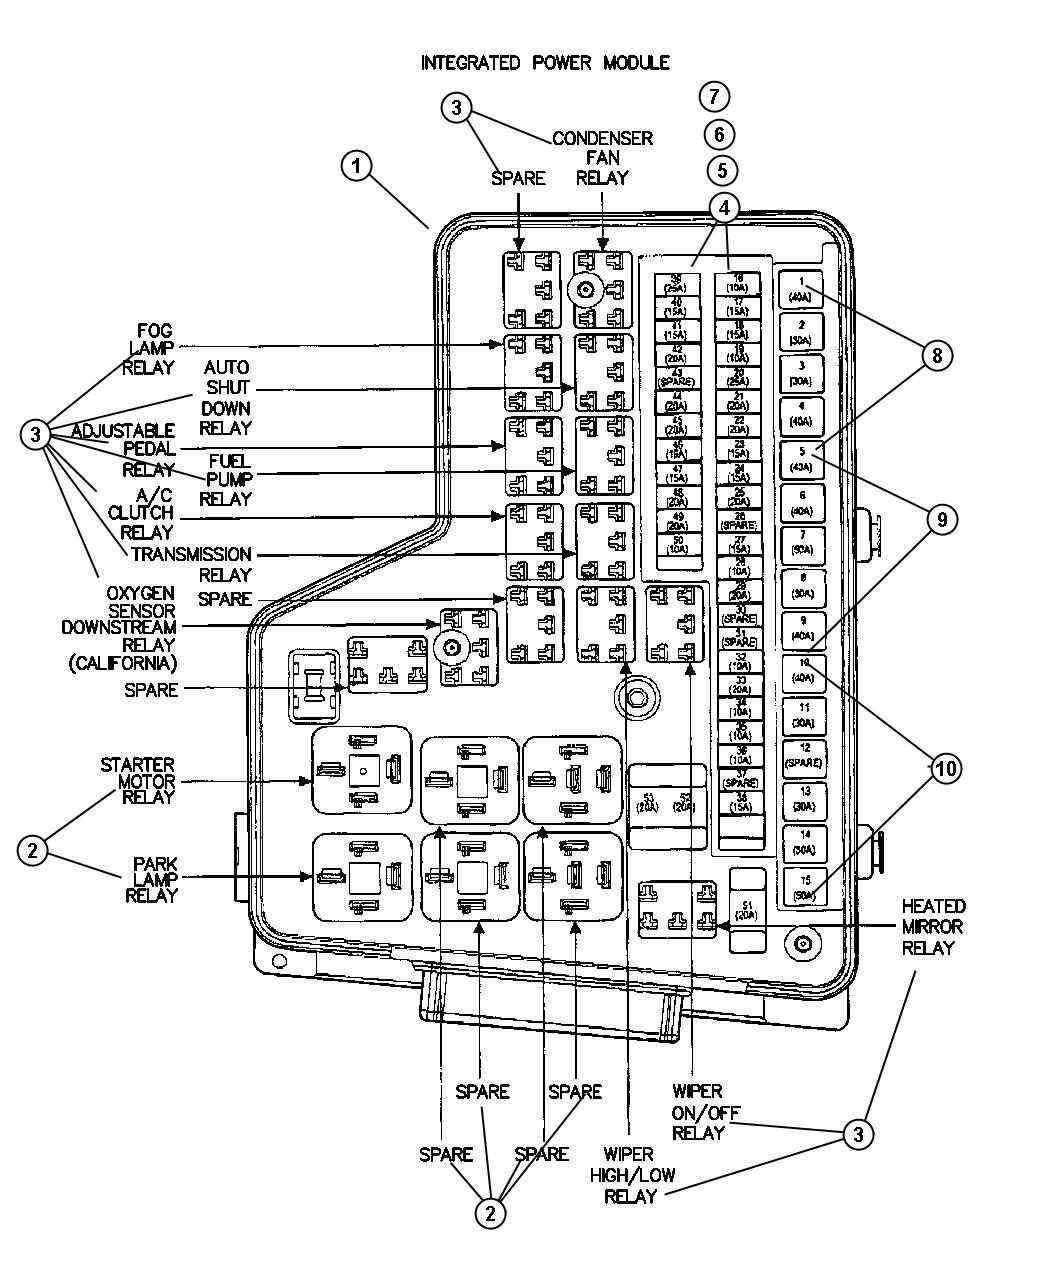 2003 dodge ram 1500 window wiring diagram kawasaki bayou parts 2000 power fuse free engine image